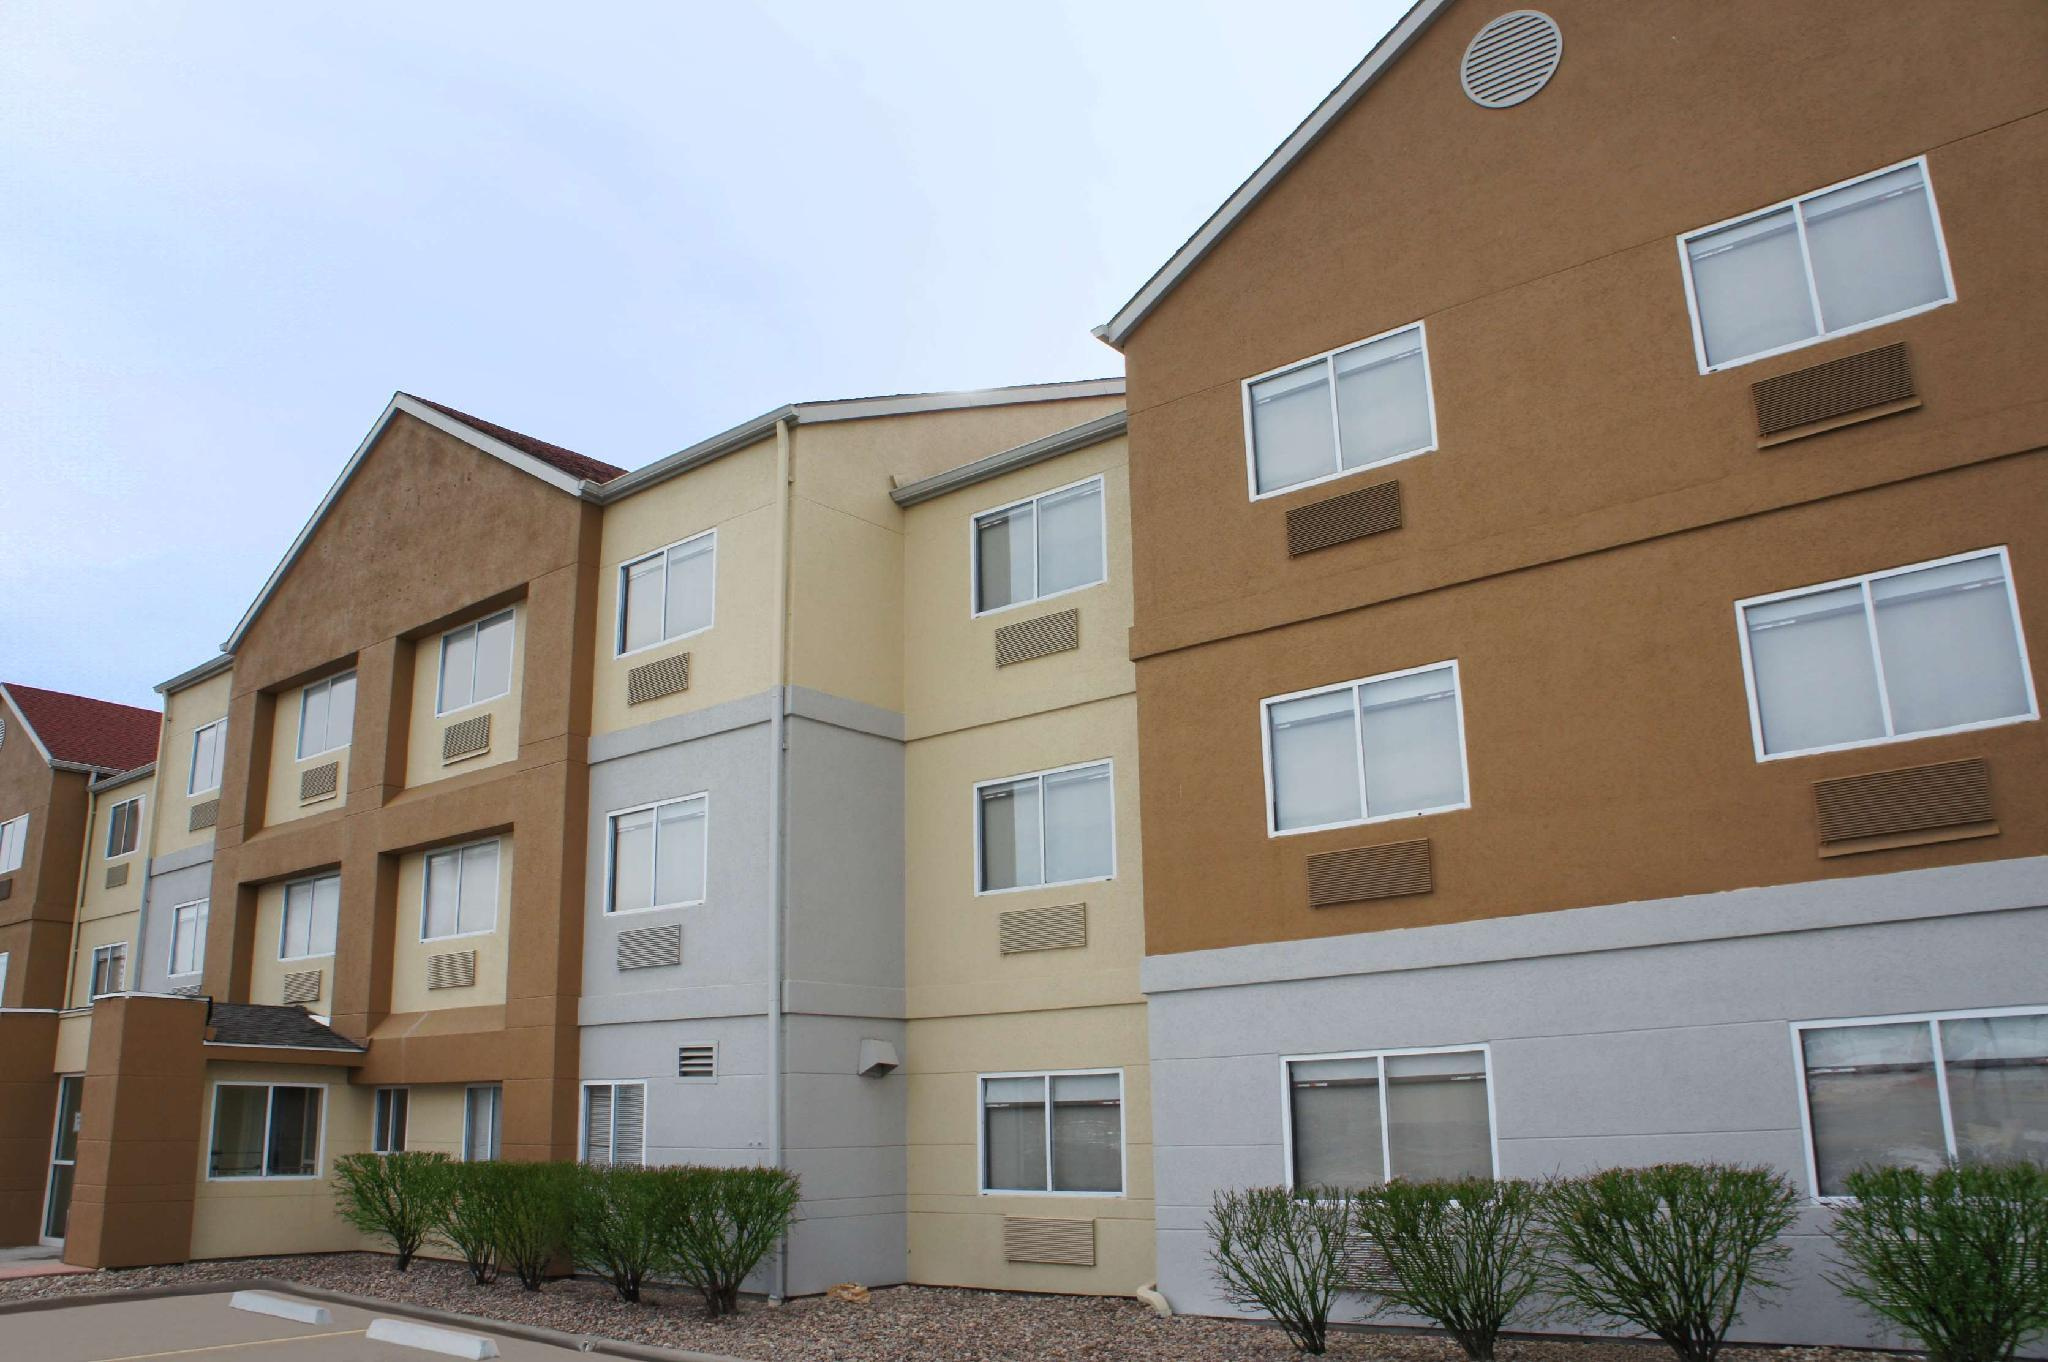 La Quinta Inn And Suites By Wyndham Emporia